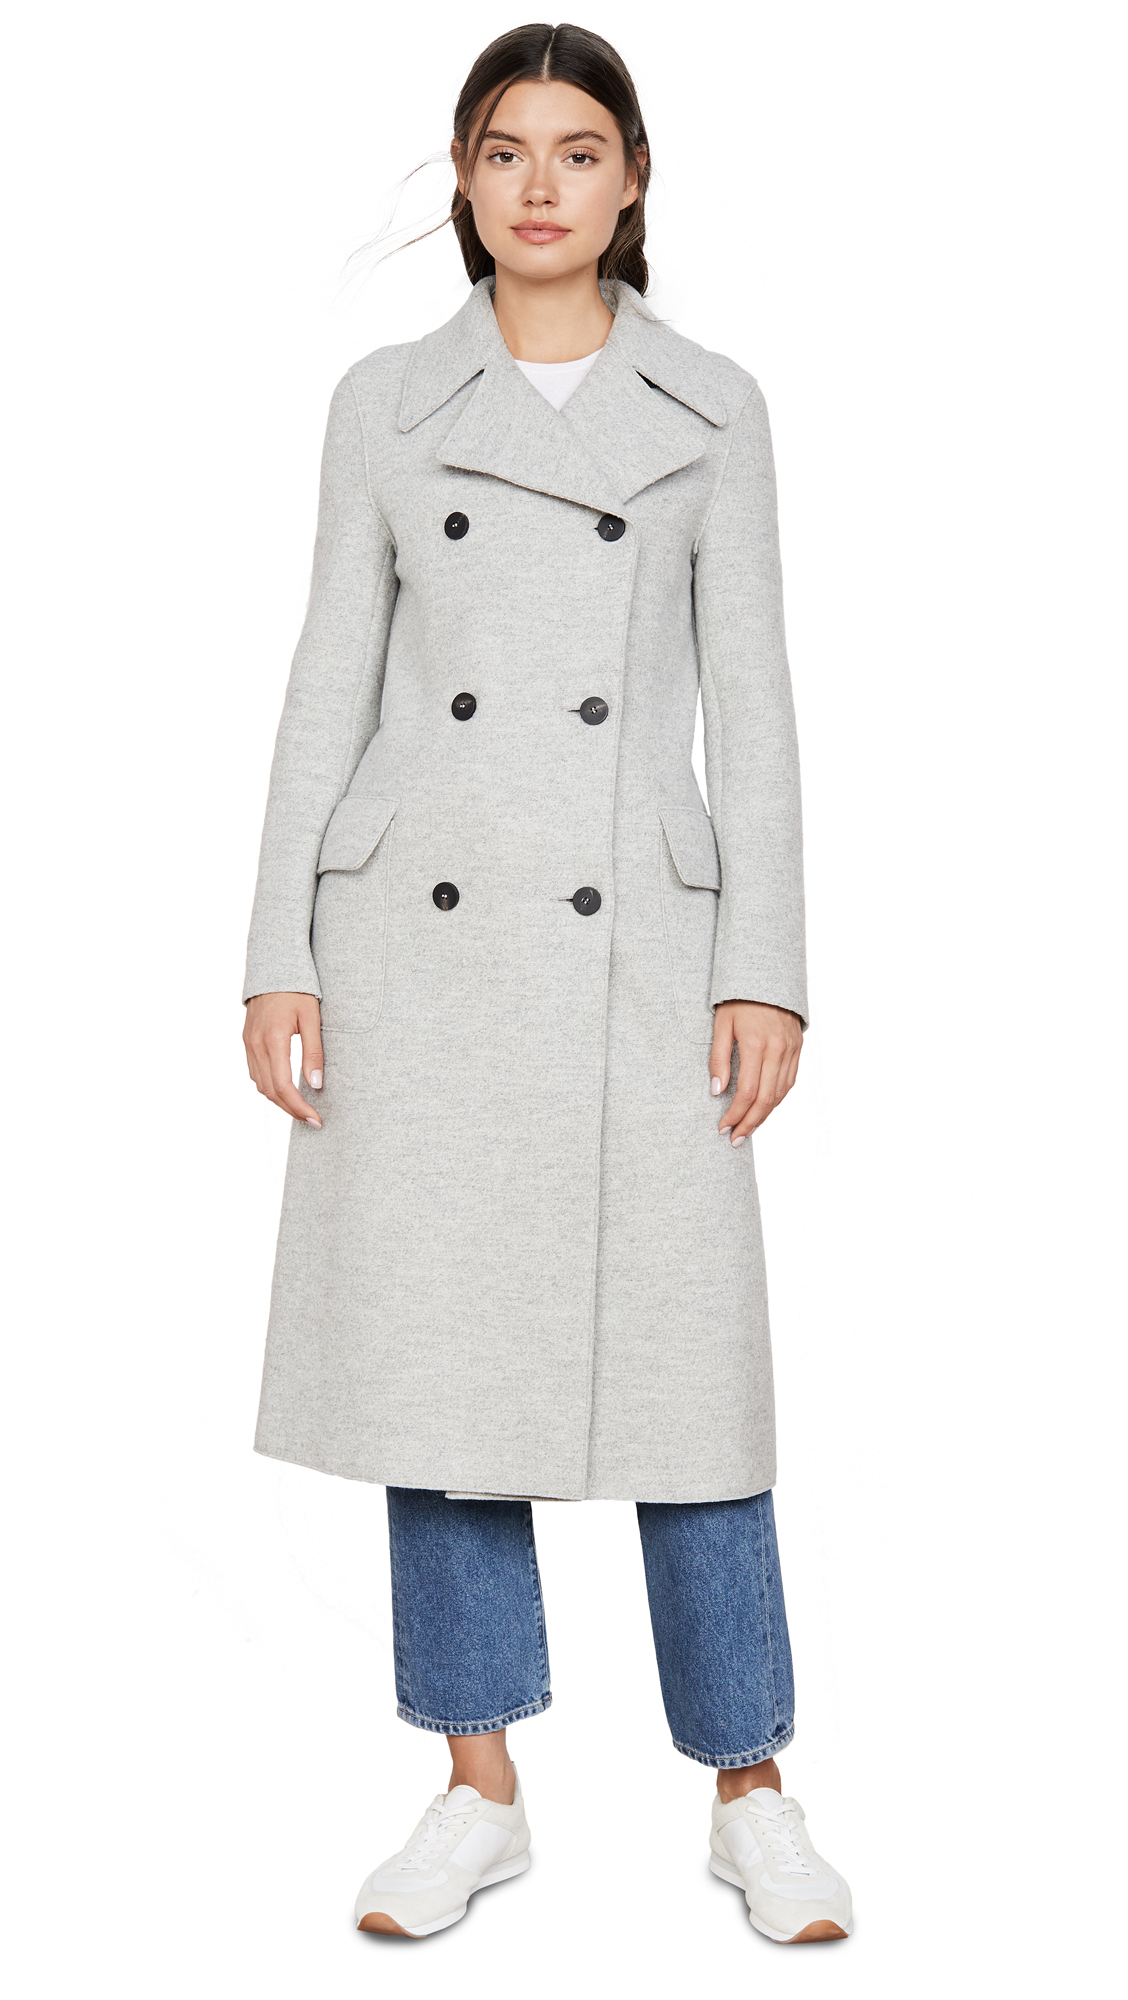 Buy Harris Wharf London Double Breasted Military Coat online beautiful Harris Wharf London Clothing, Jackets